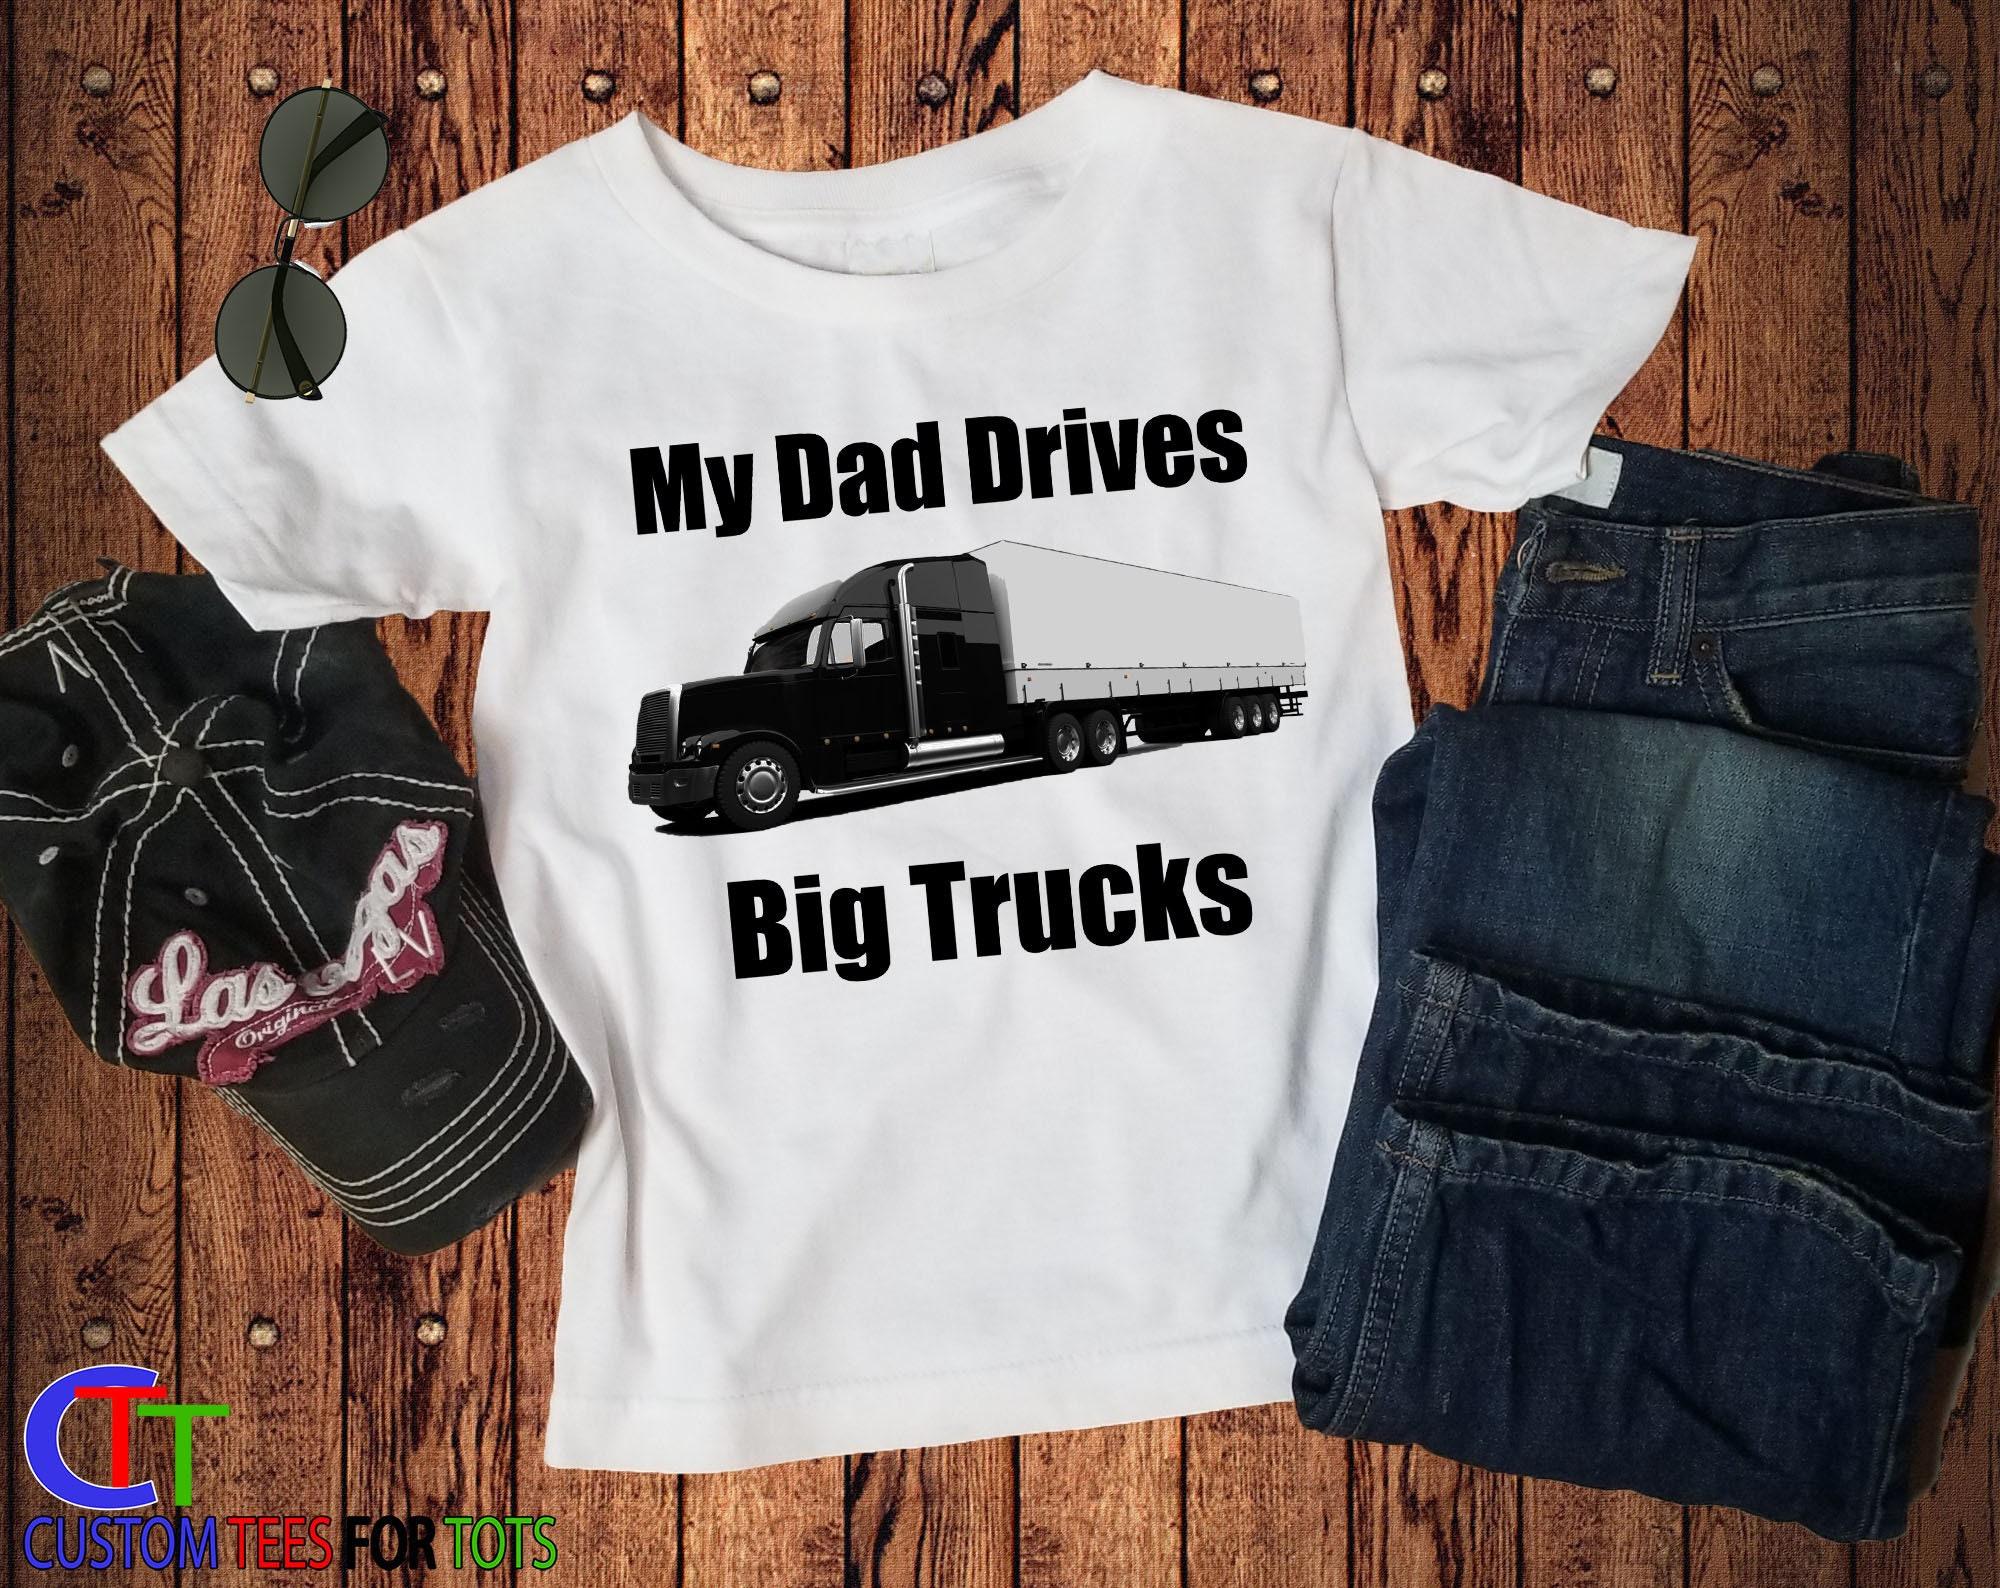 89a62590 ... Semi driver shirt - kids trucker shirt - i love my dad. gallery photo  gallery photo